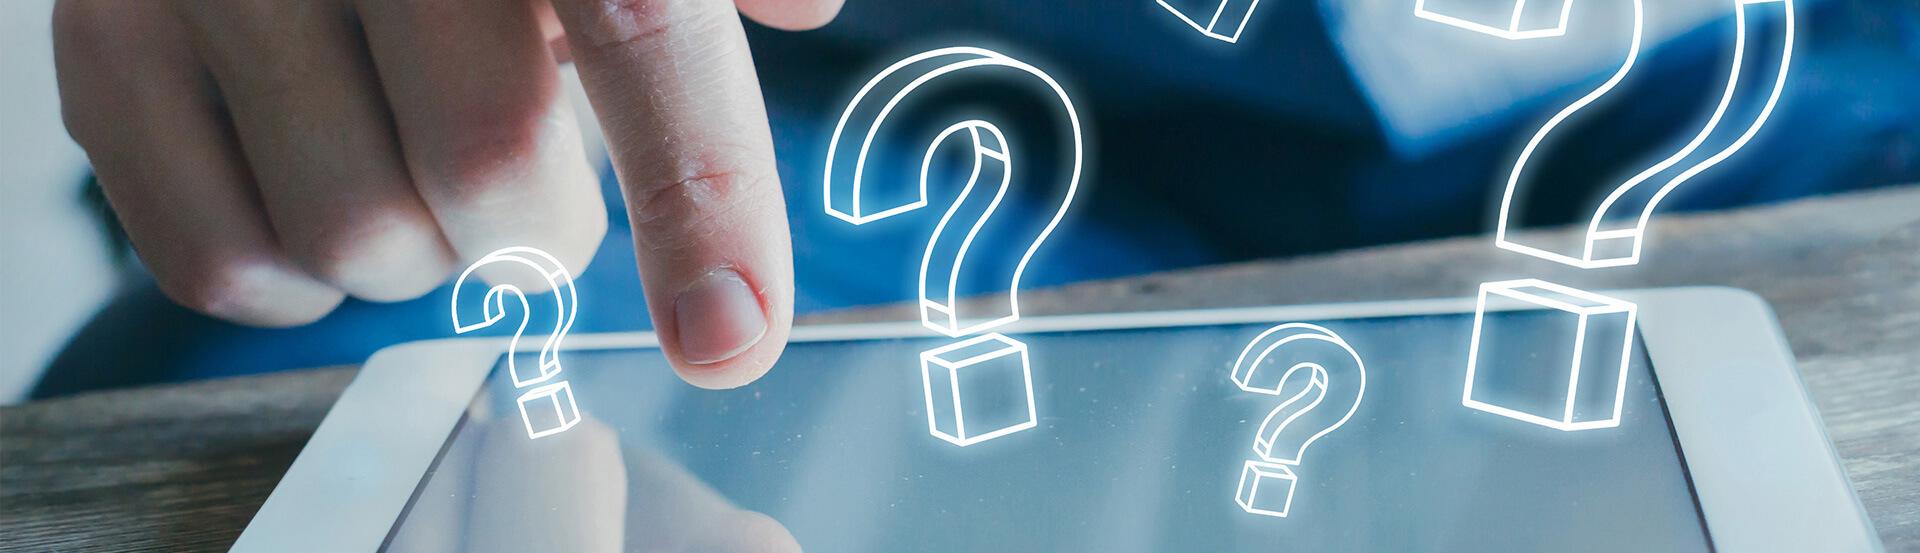 Questionnaire sur iphone, smartphone, androïd, galaxy, nexus